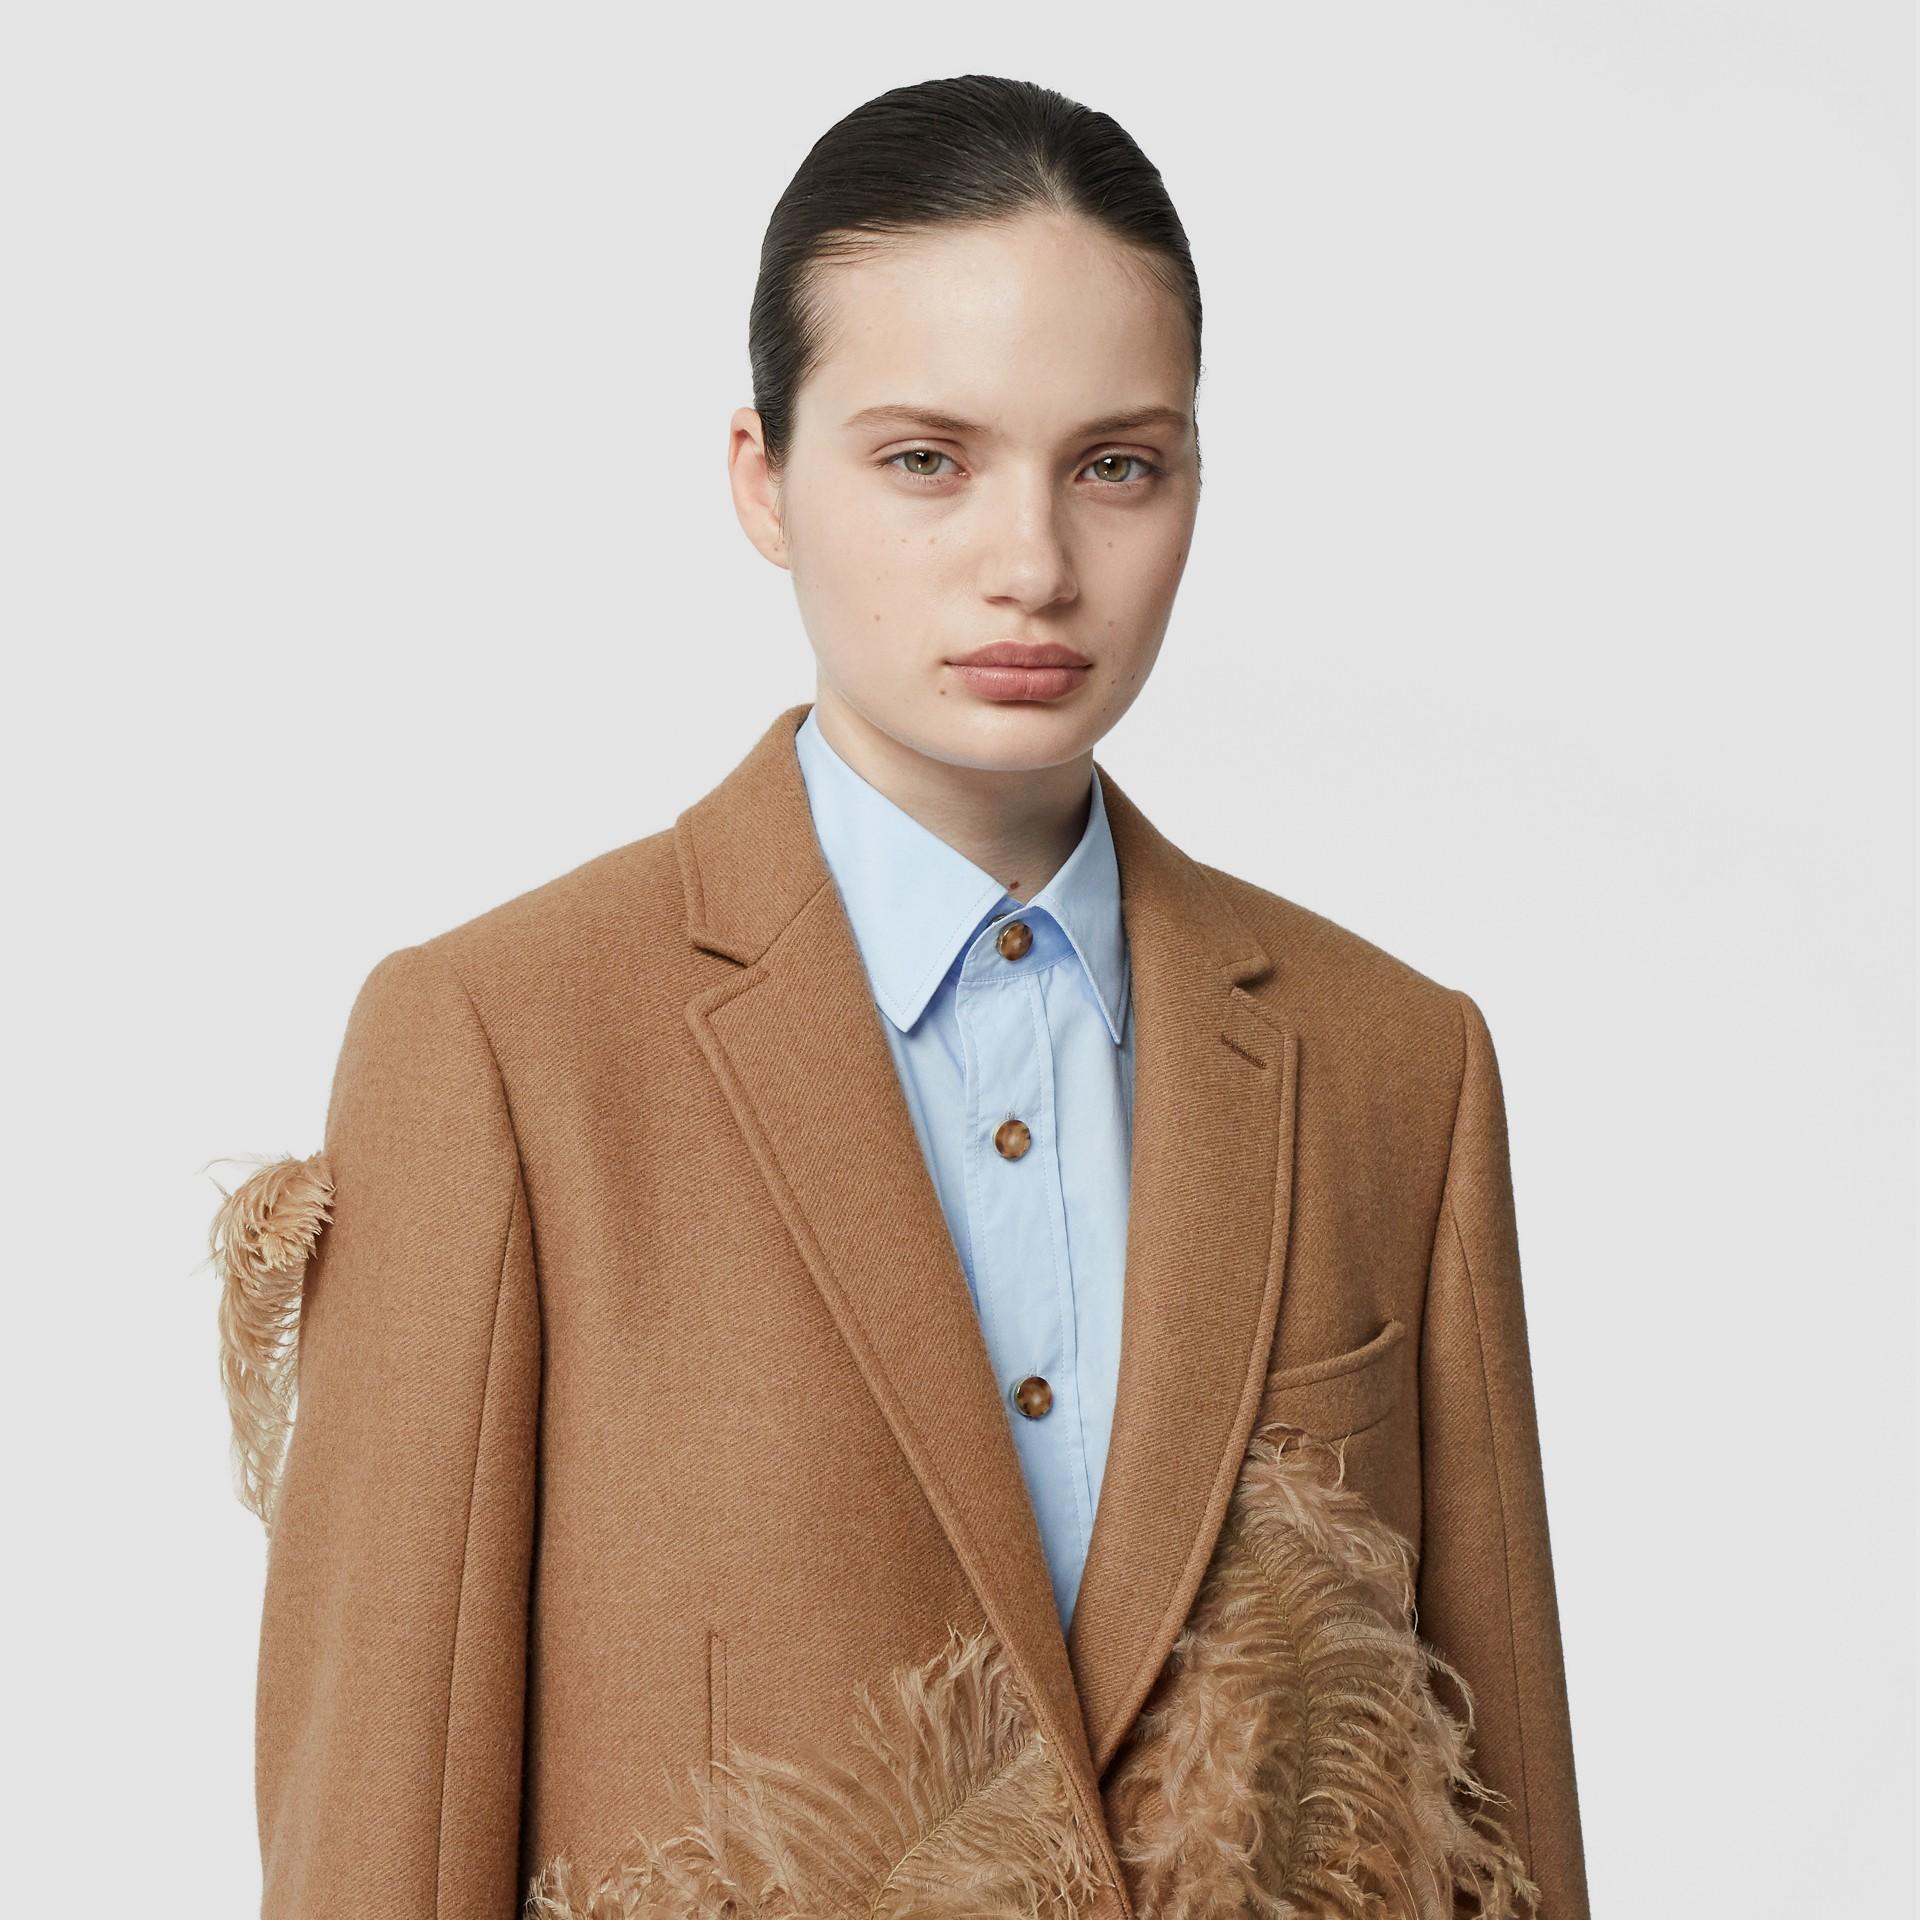 Abrigo de vestir en pelo de camello con detalle de plumas (Cámel) - Mujer | Burberry - imagen de la galería 1